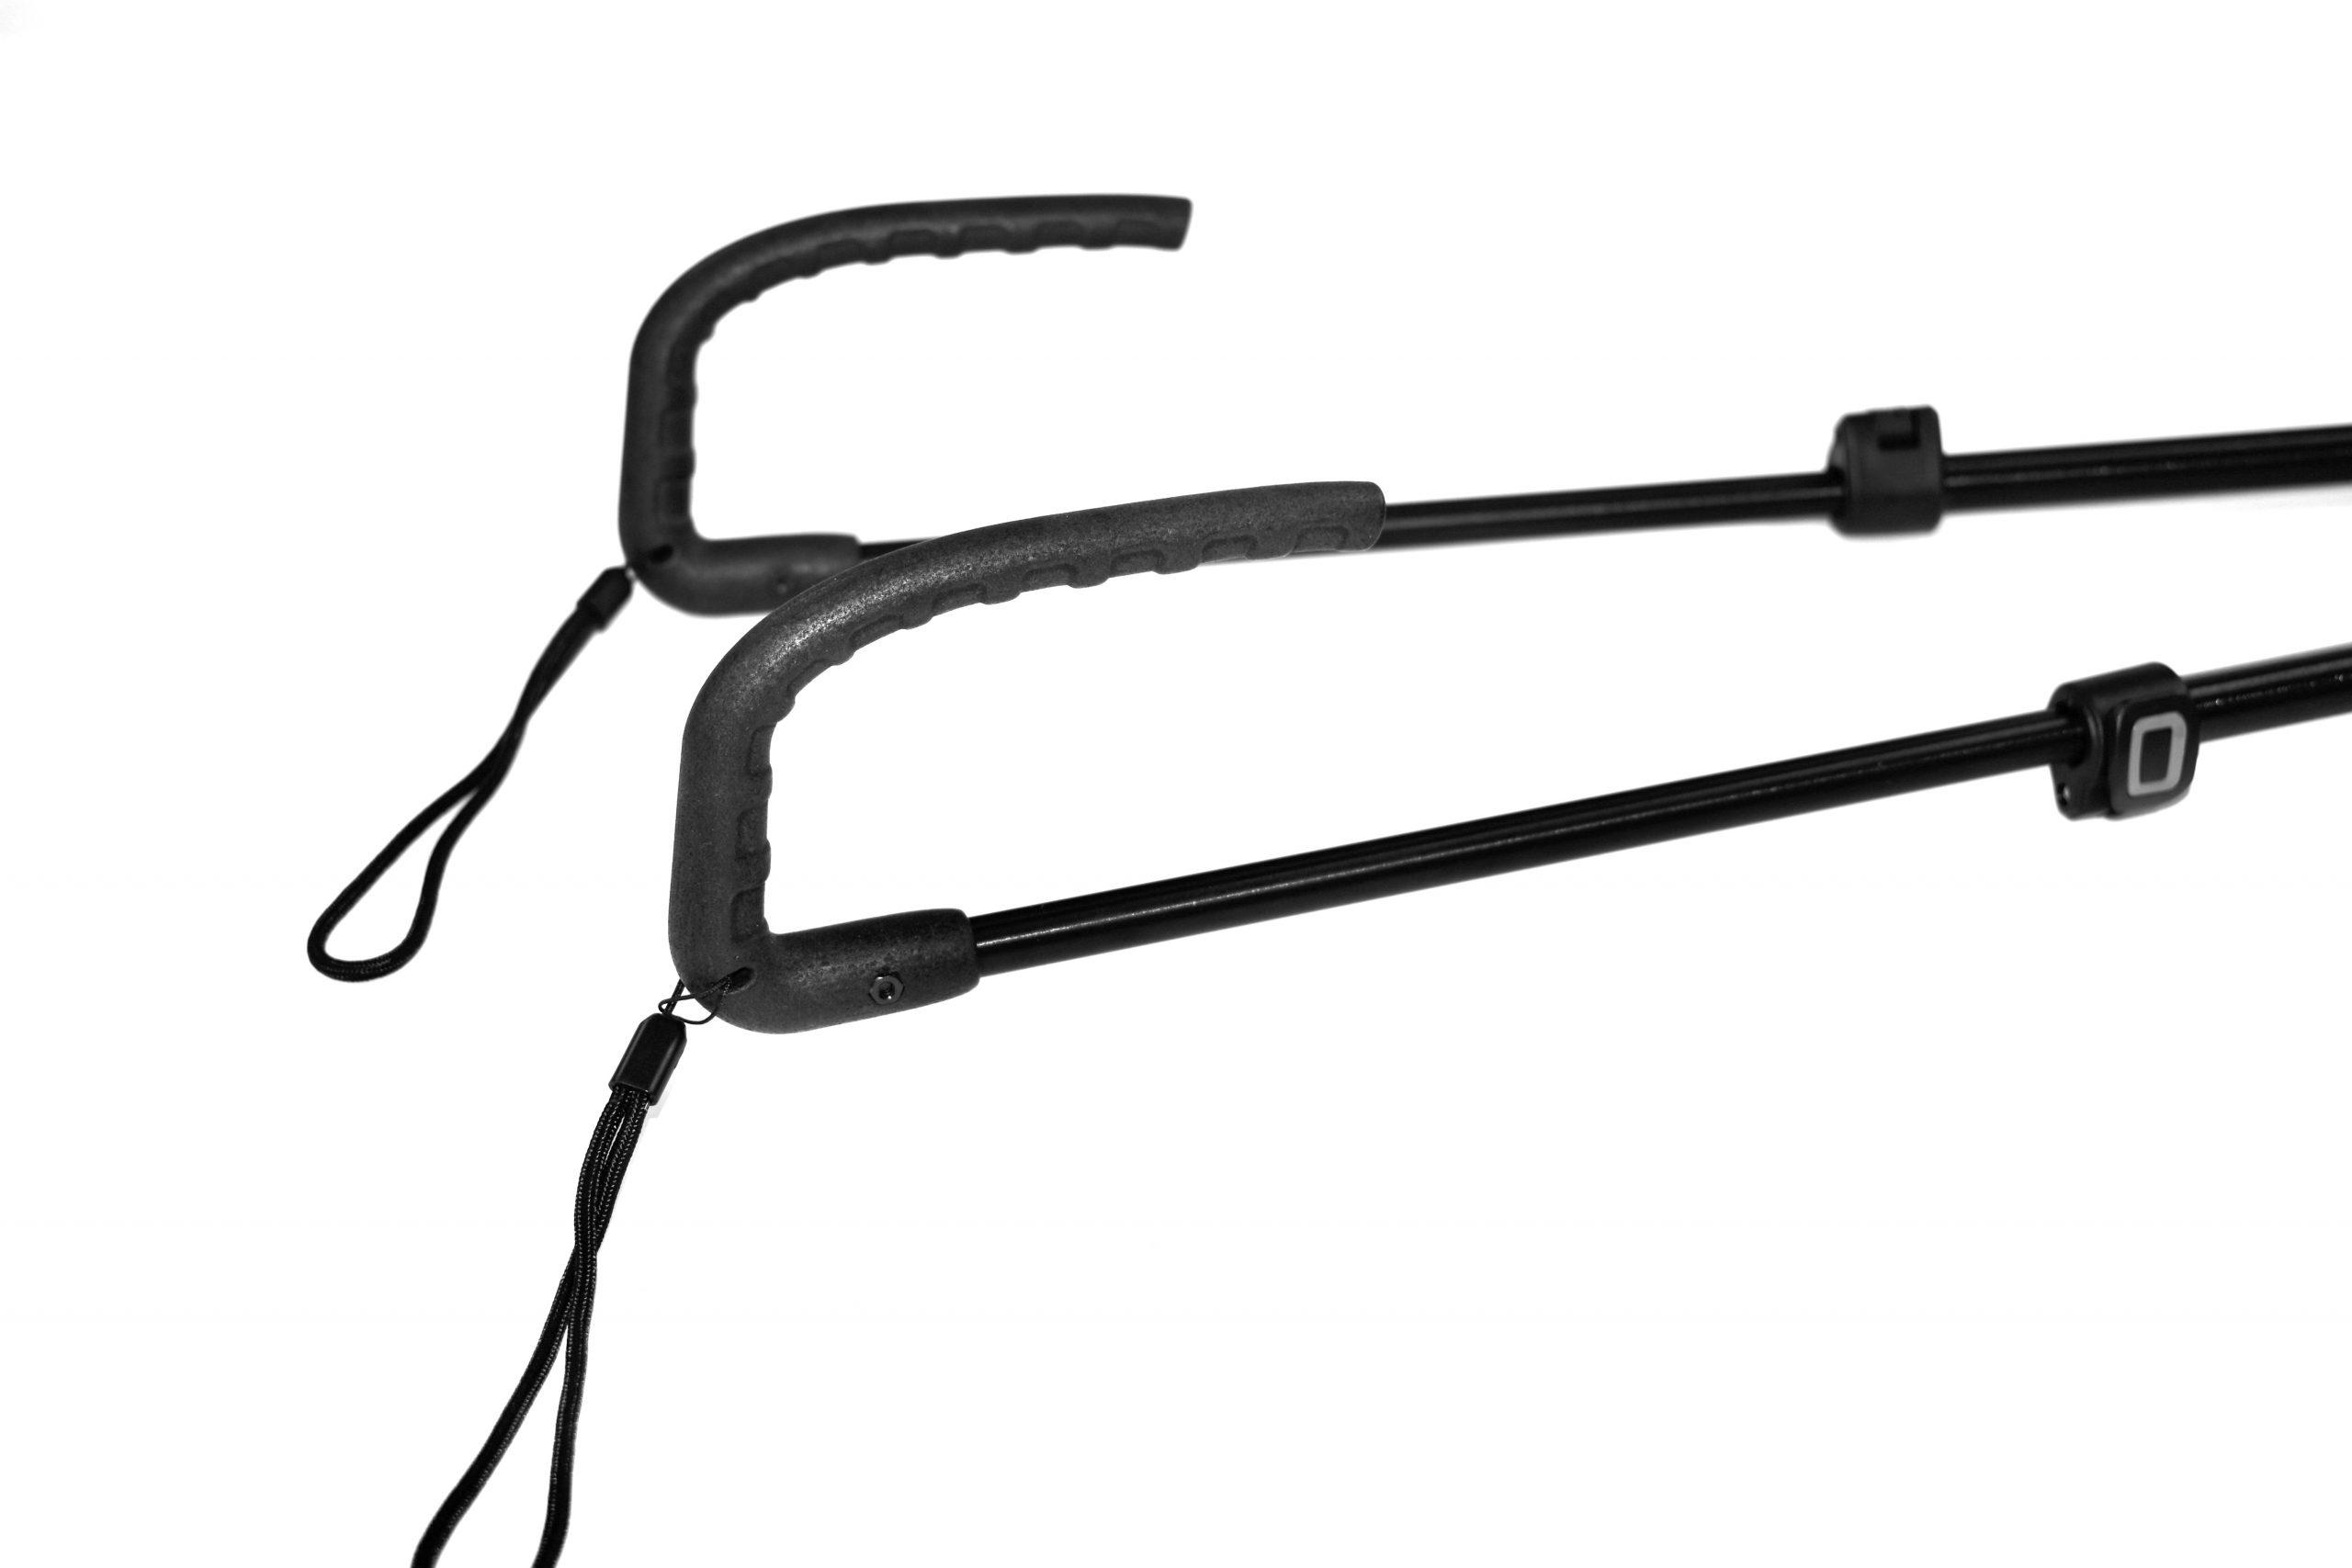 Photo description: A close up of the handles of the cane